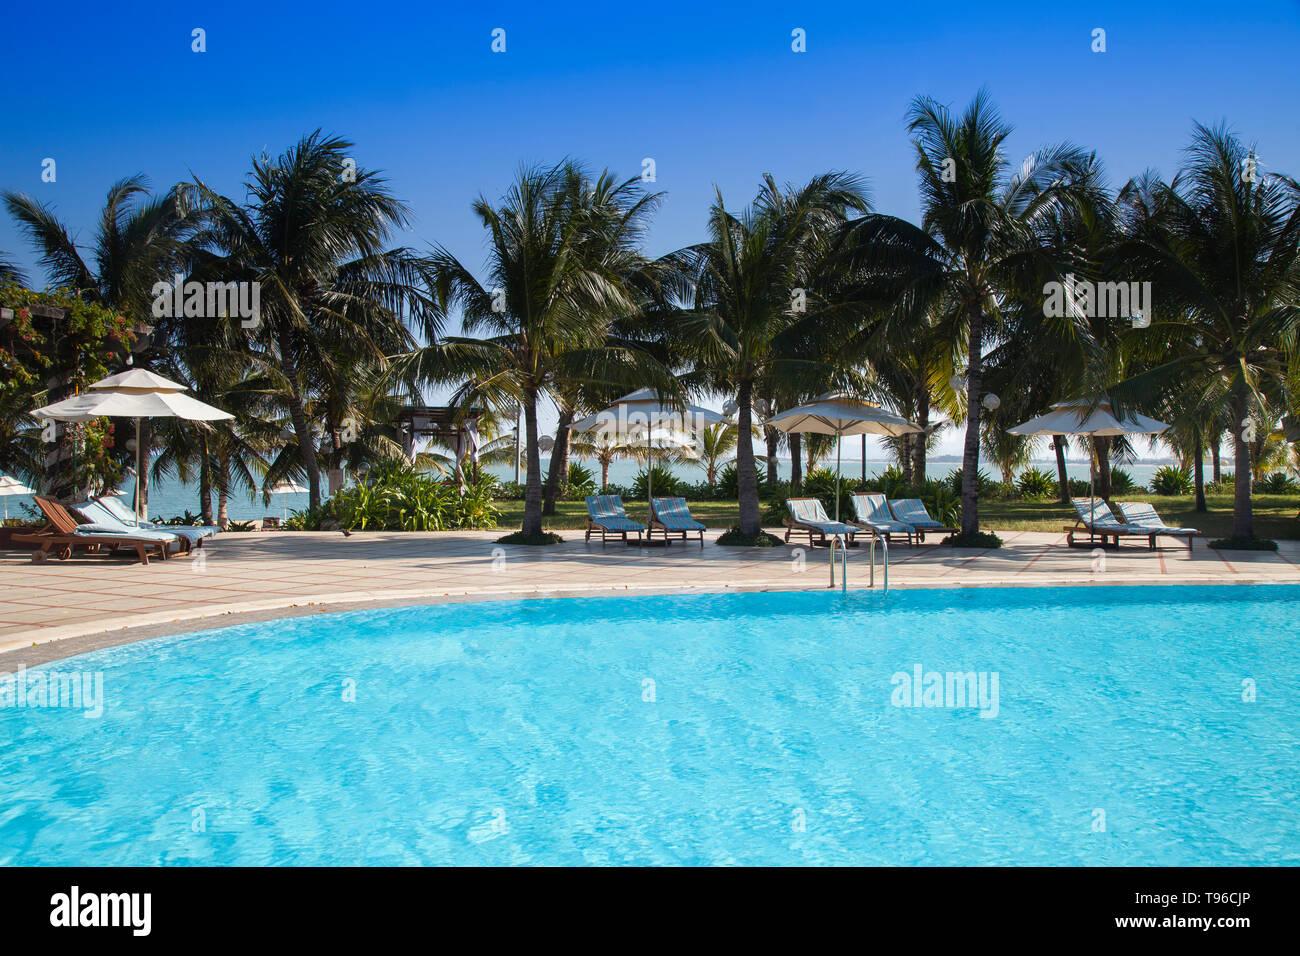 Swimming pool of Saigon Ninh Chu Resort on Phan Rang Beach,south china sea, Ninh Thuan, Vietnam - Stock Image